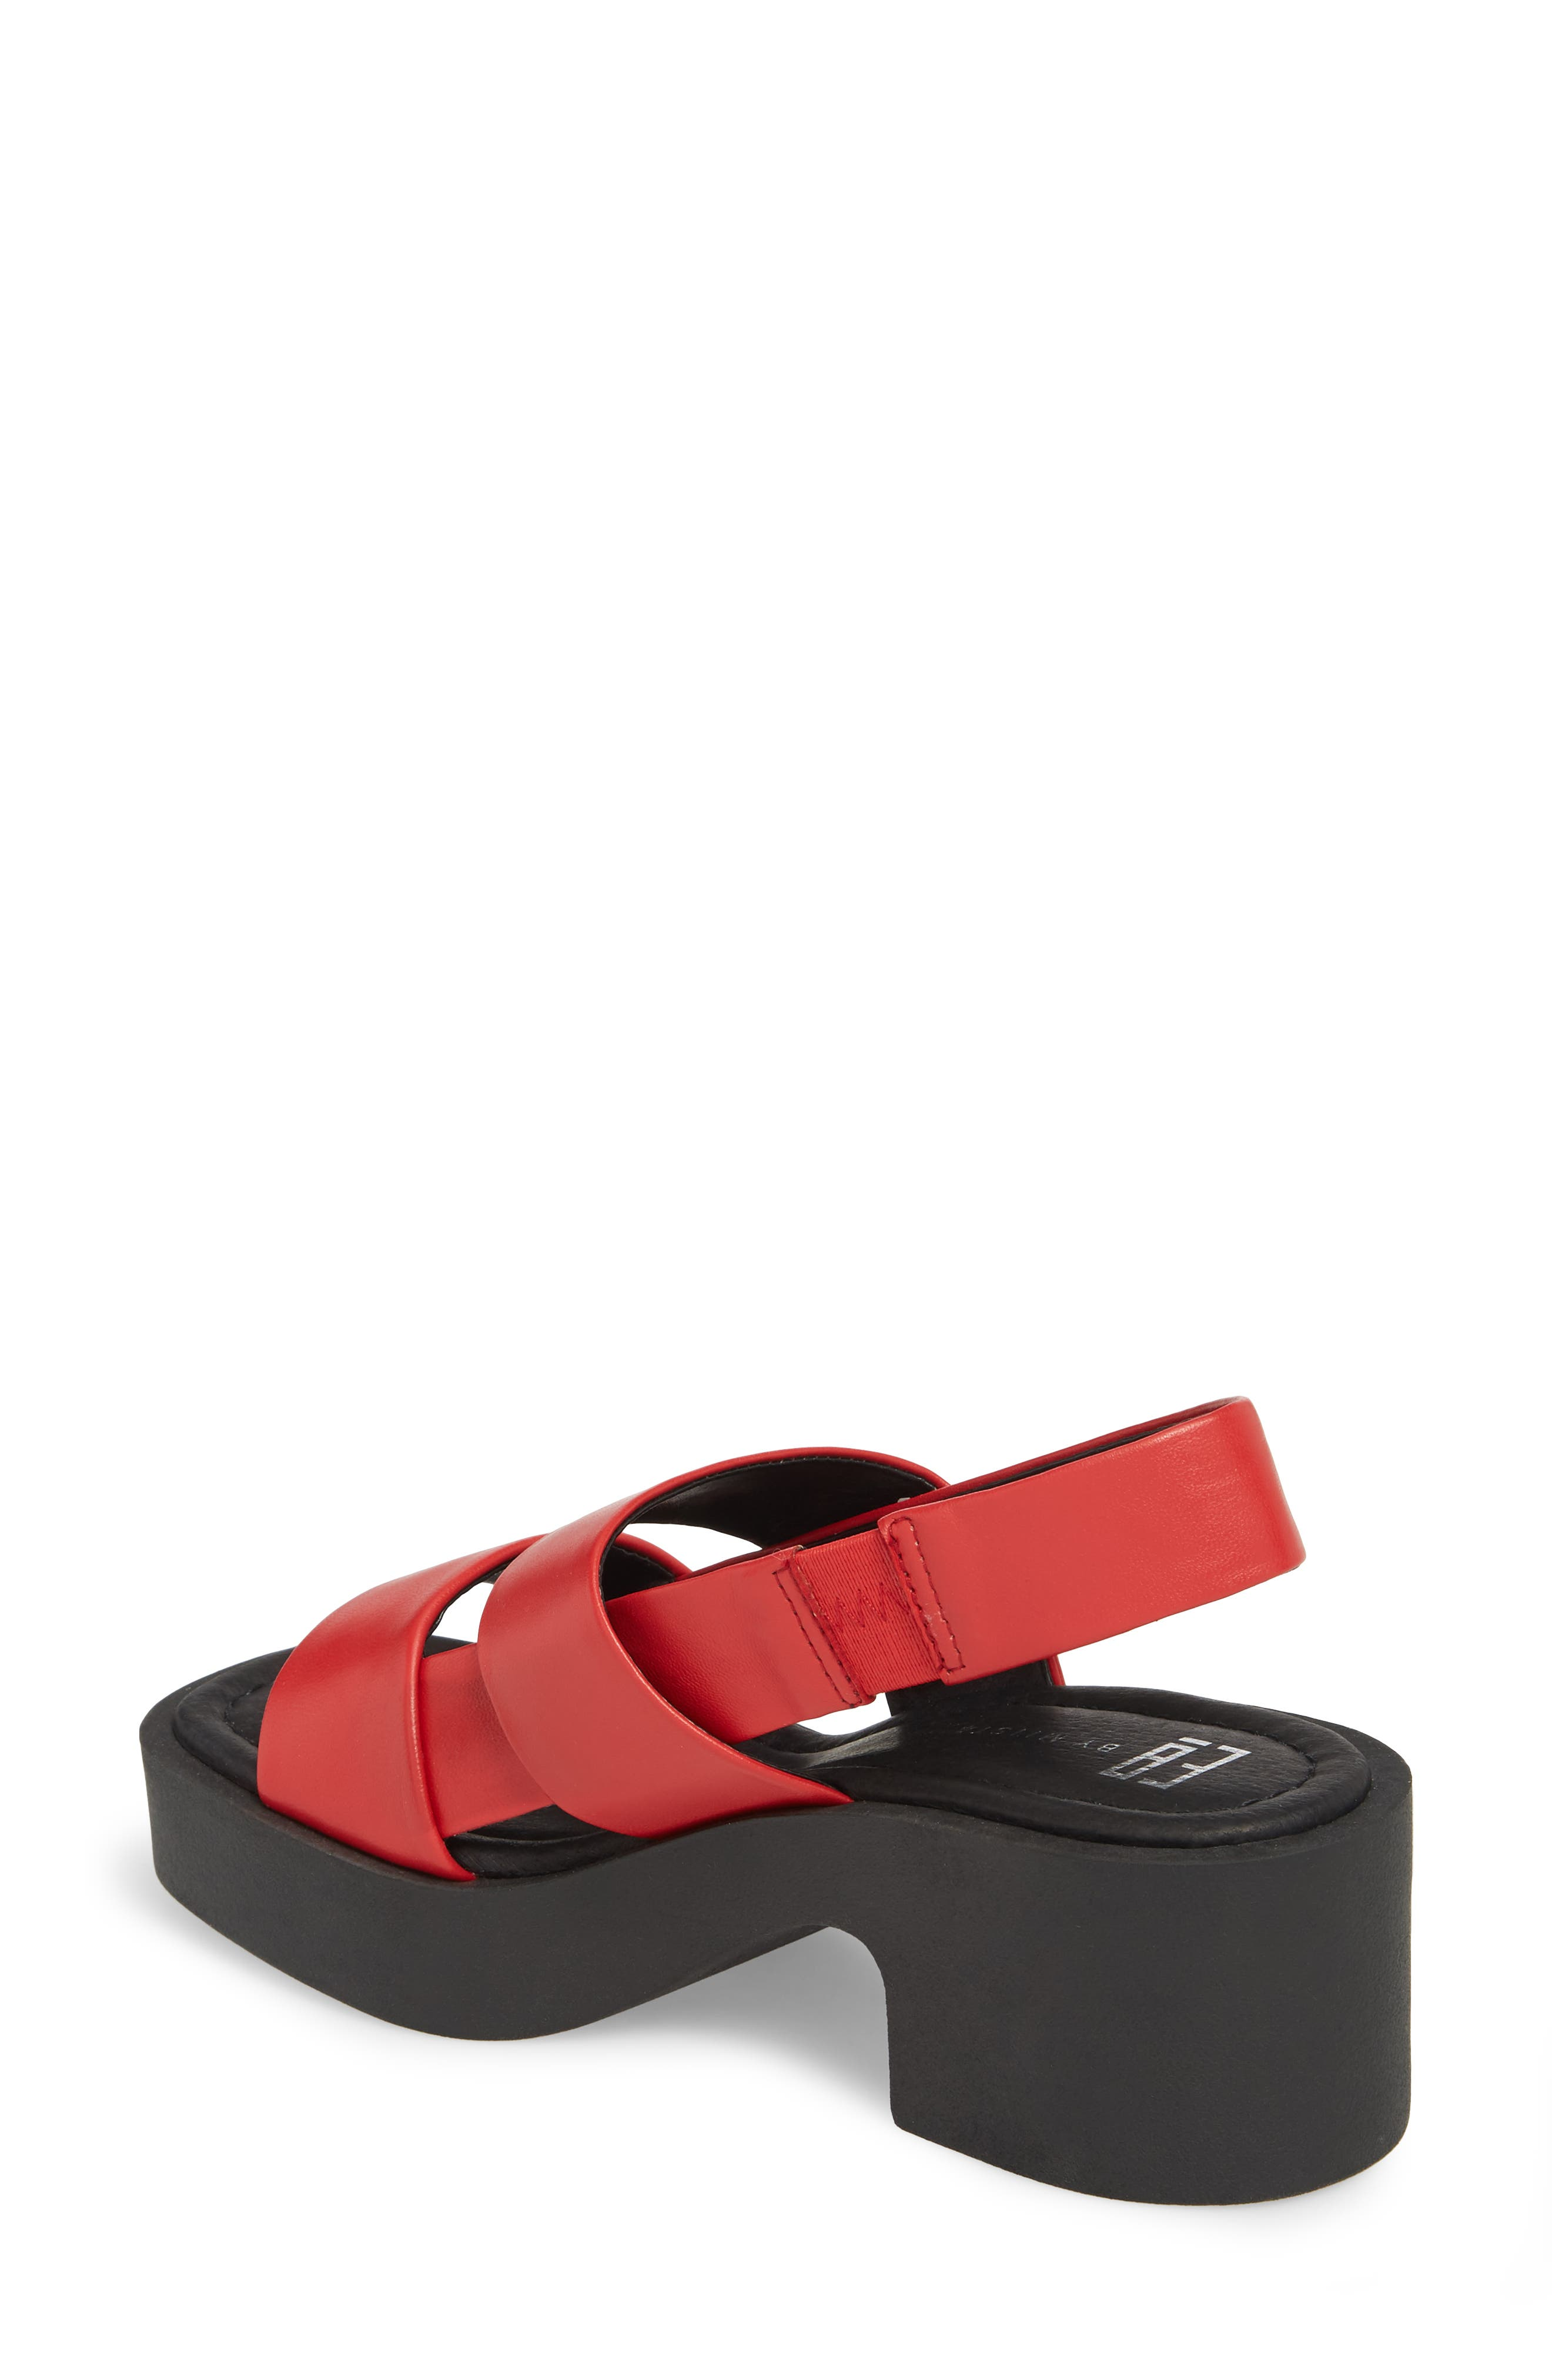 Hazel Slingback Sandal,                             Alternate thumbnail 2, color,                             Red Leather